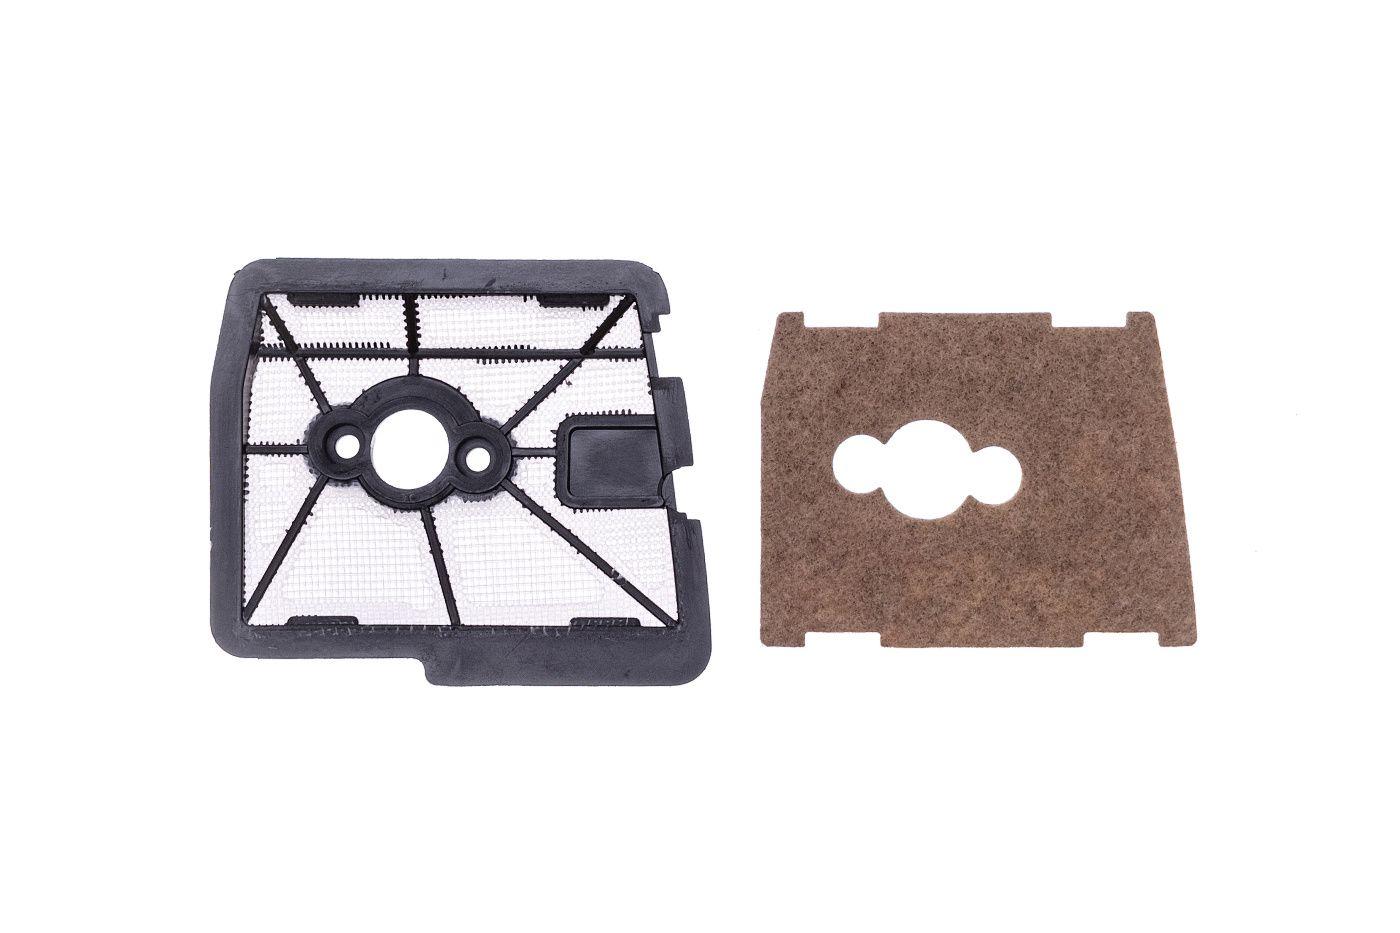 Vzduchový filtr Stihl FS550 FS500 FS420 FS360